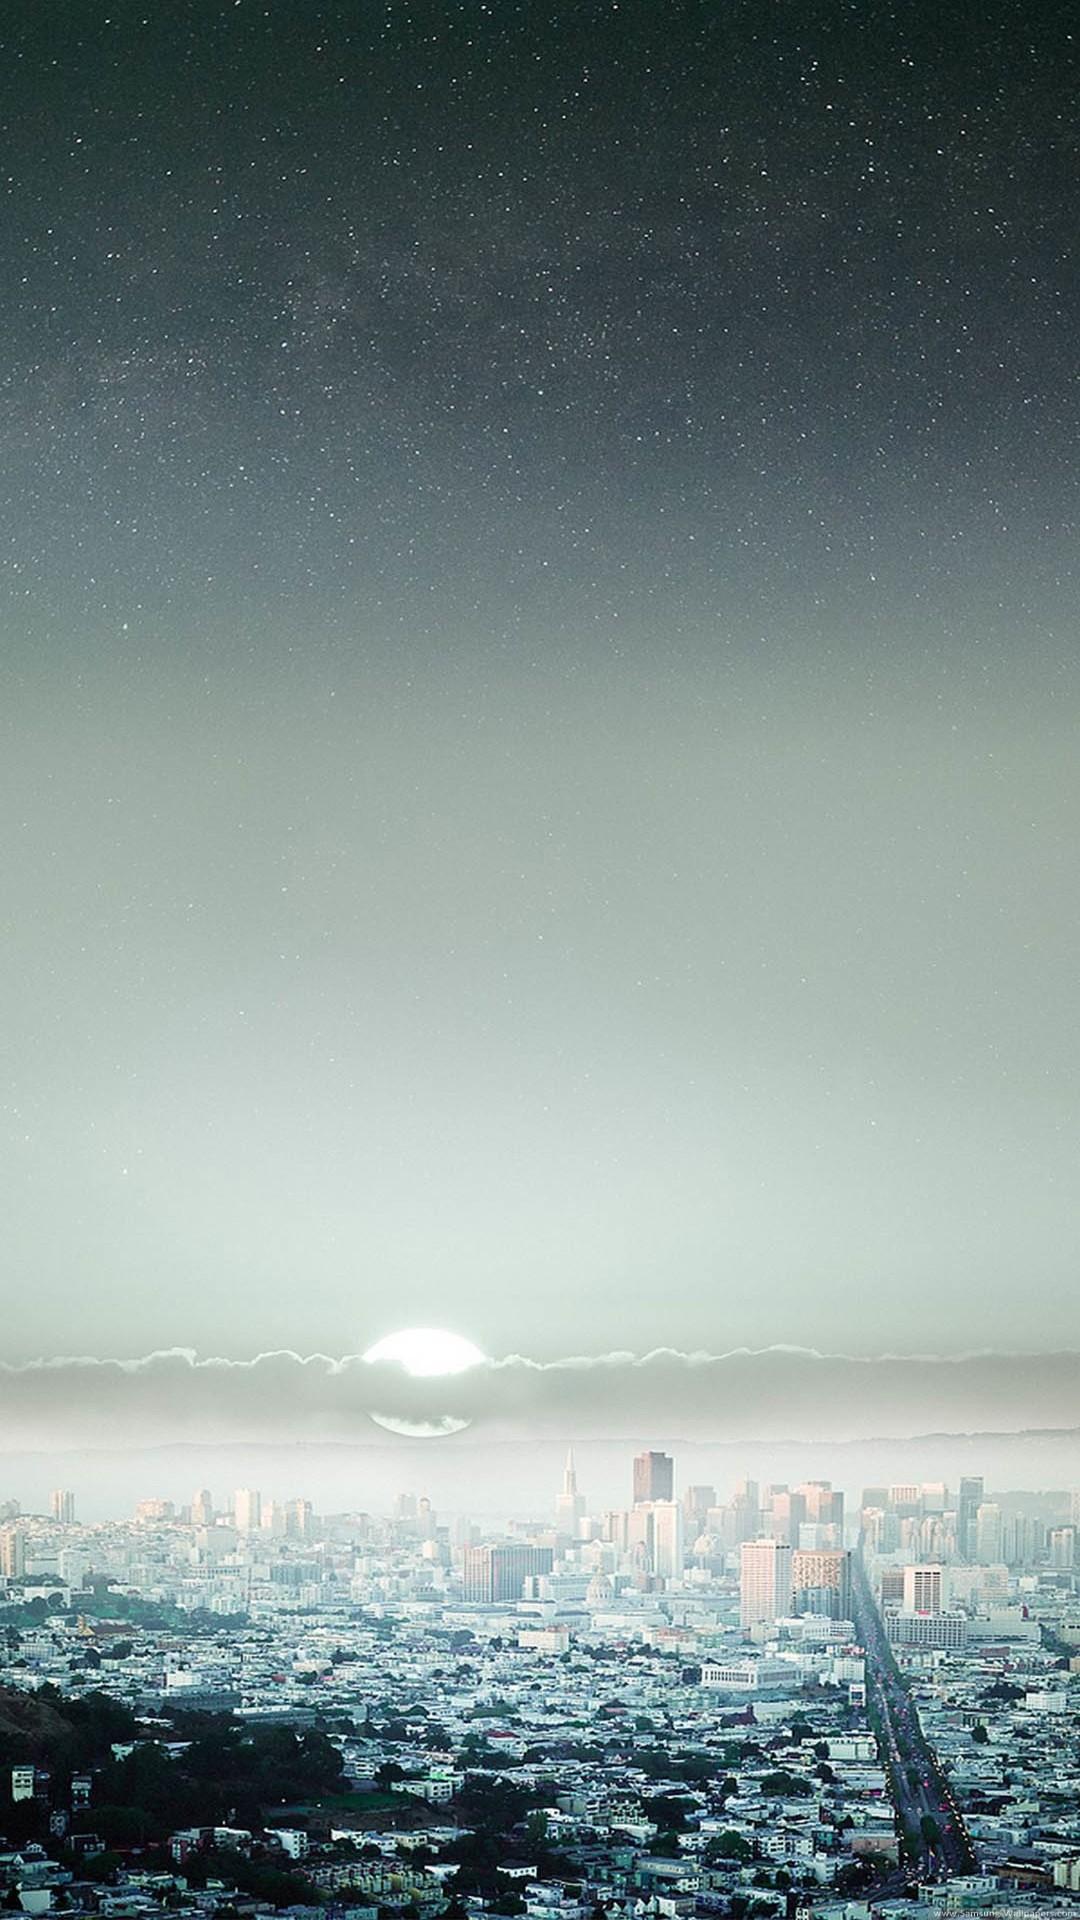 Starry Night Sky Big City iPhone 6 Plus HD Wallpaper …